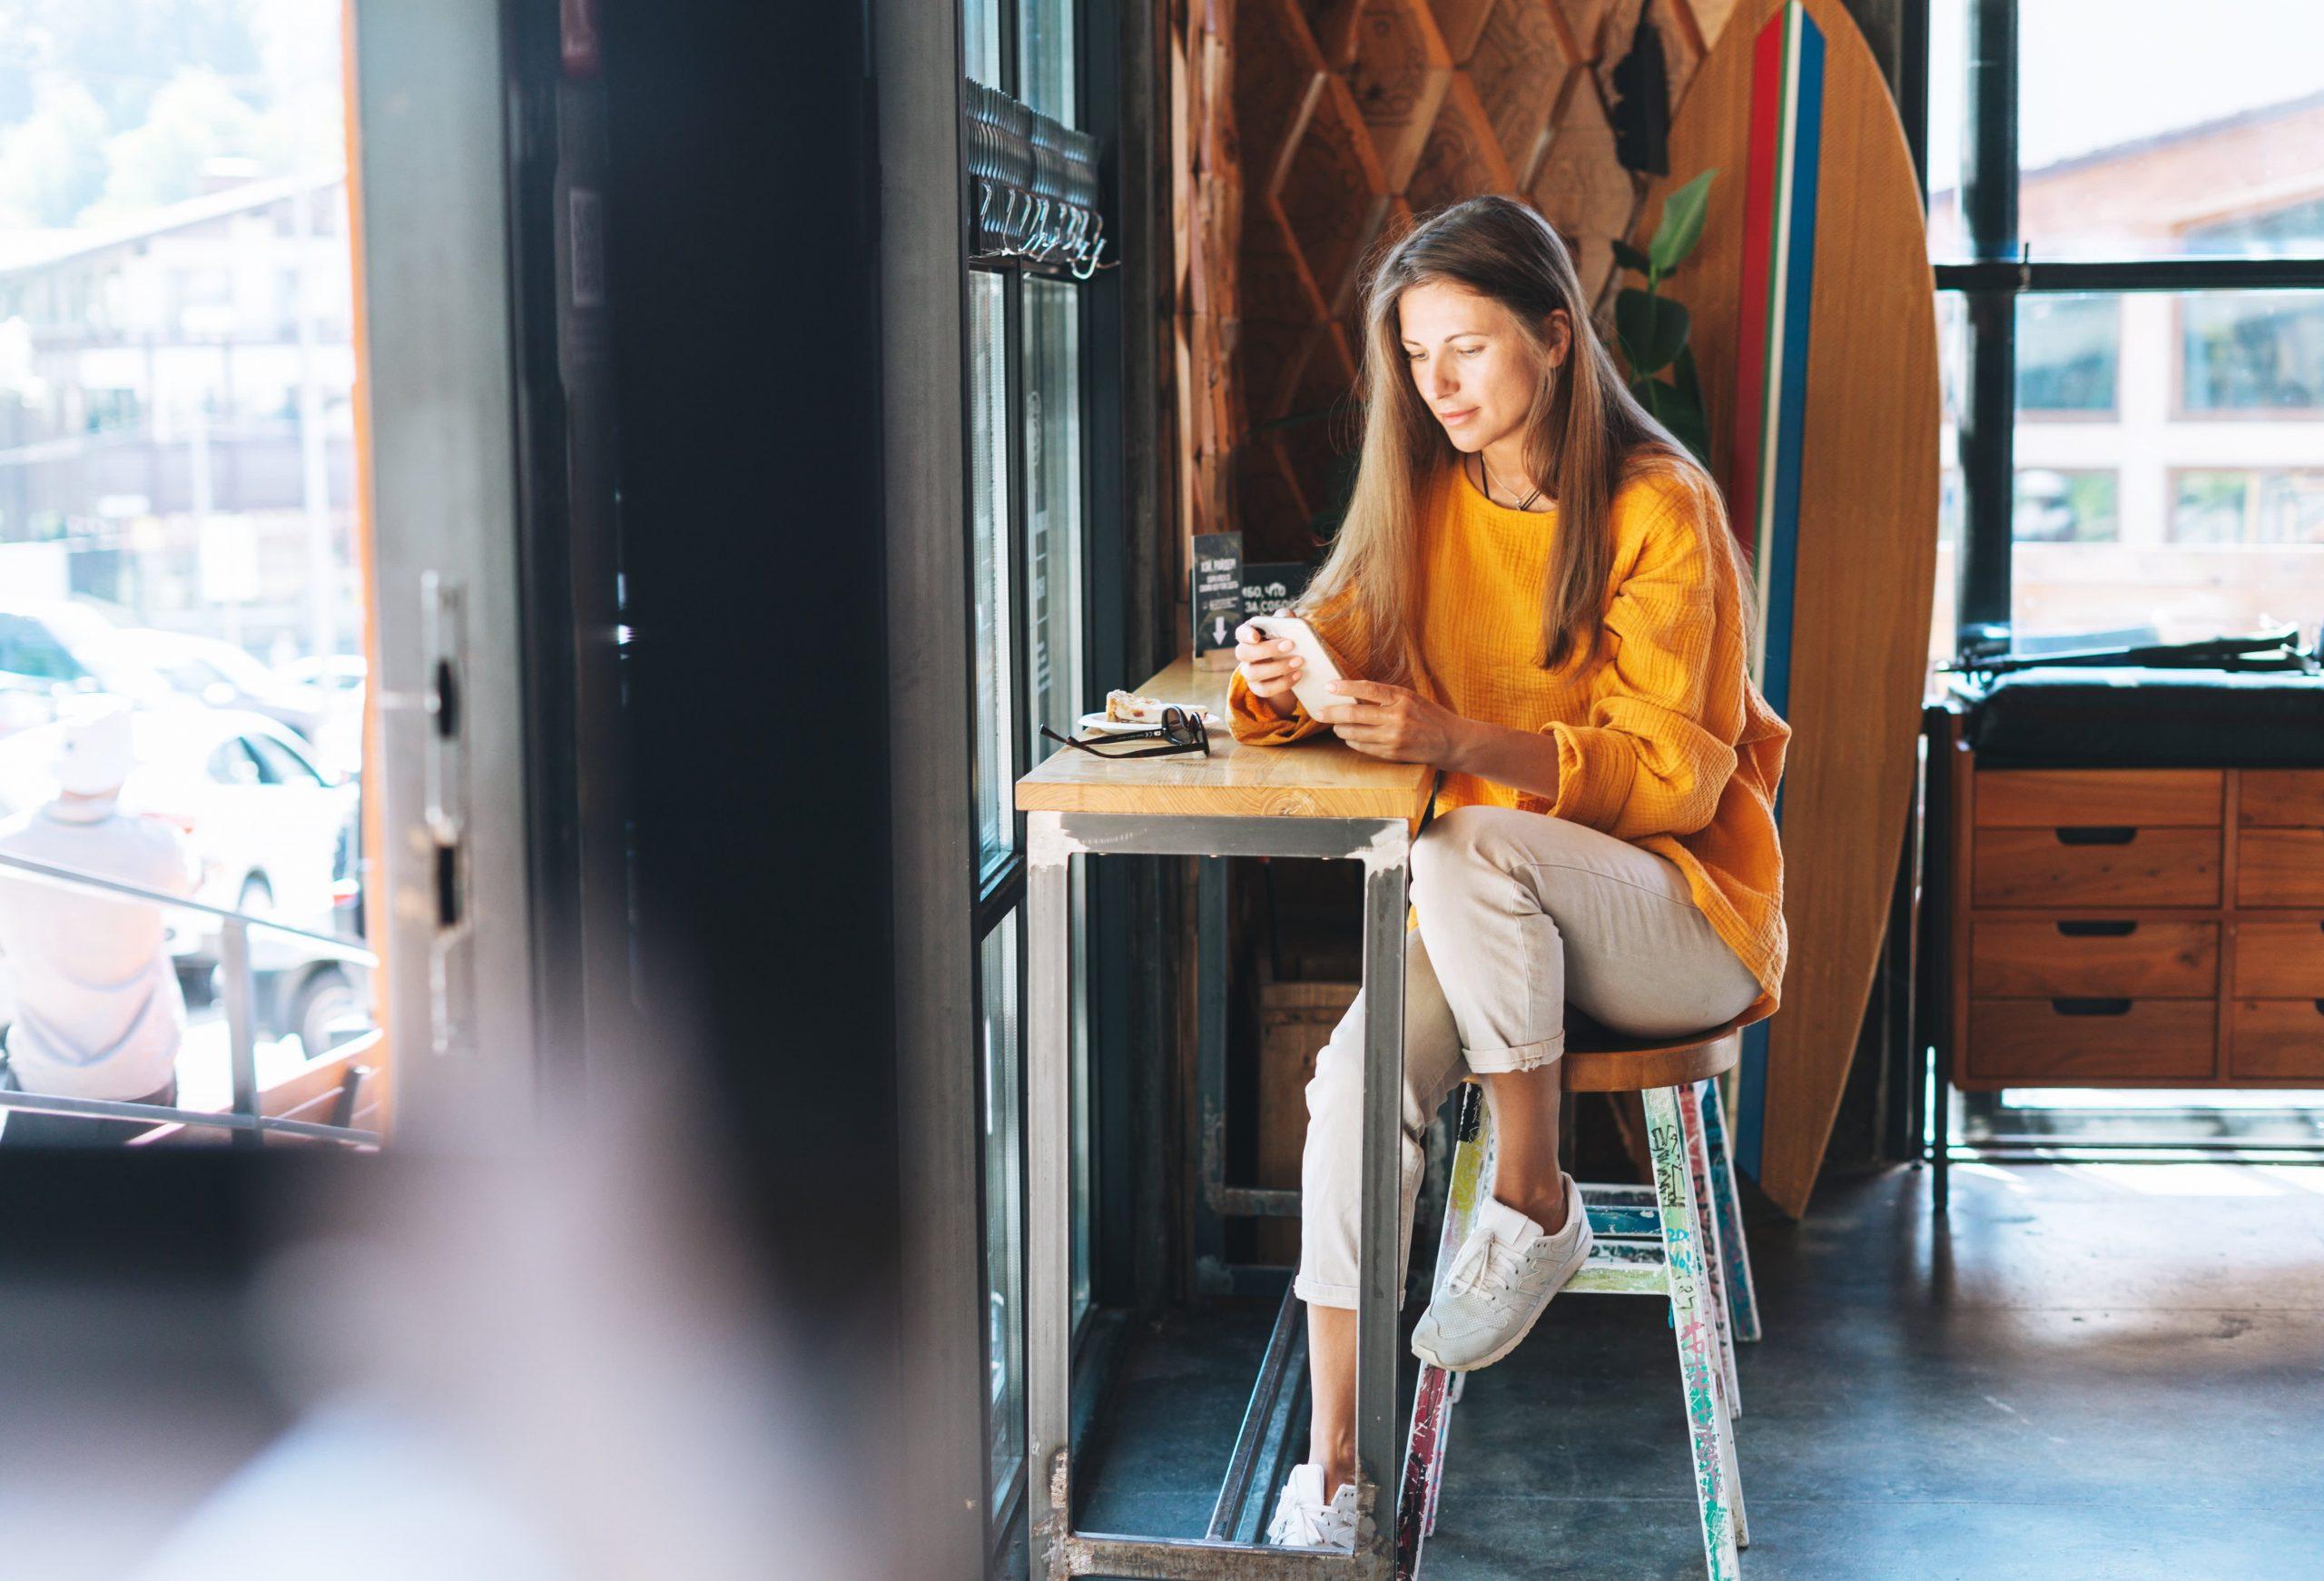 Most important factors for raising your credit score